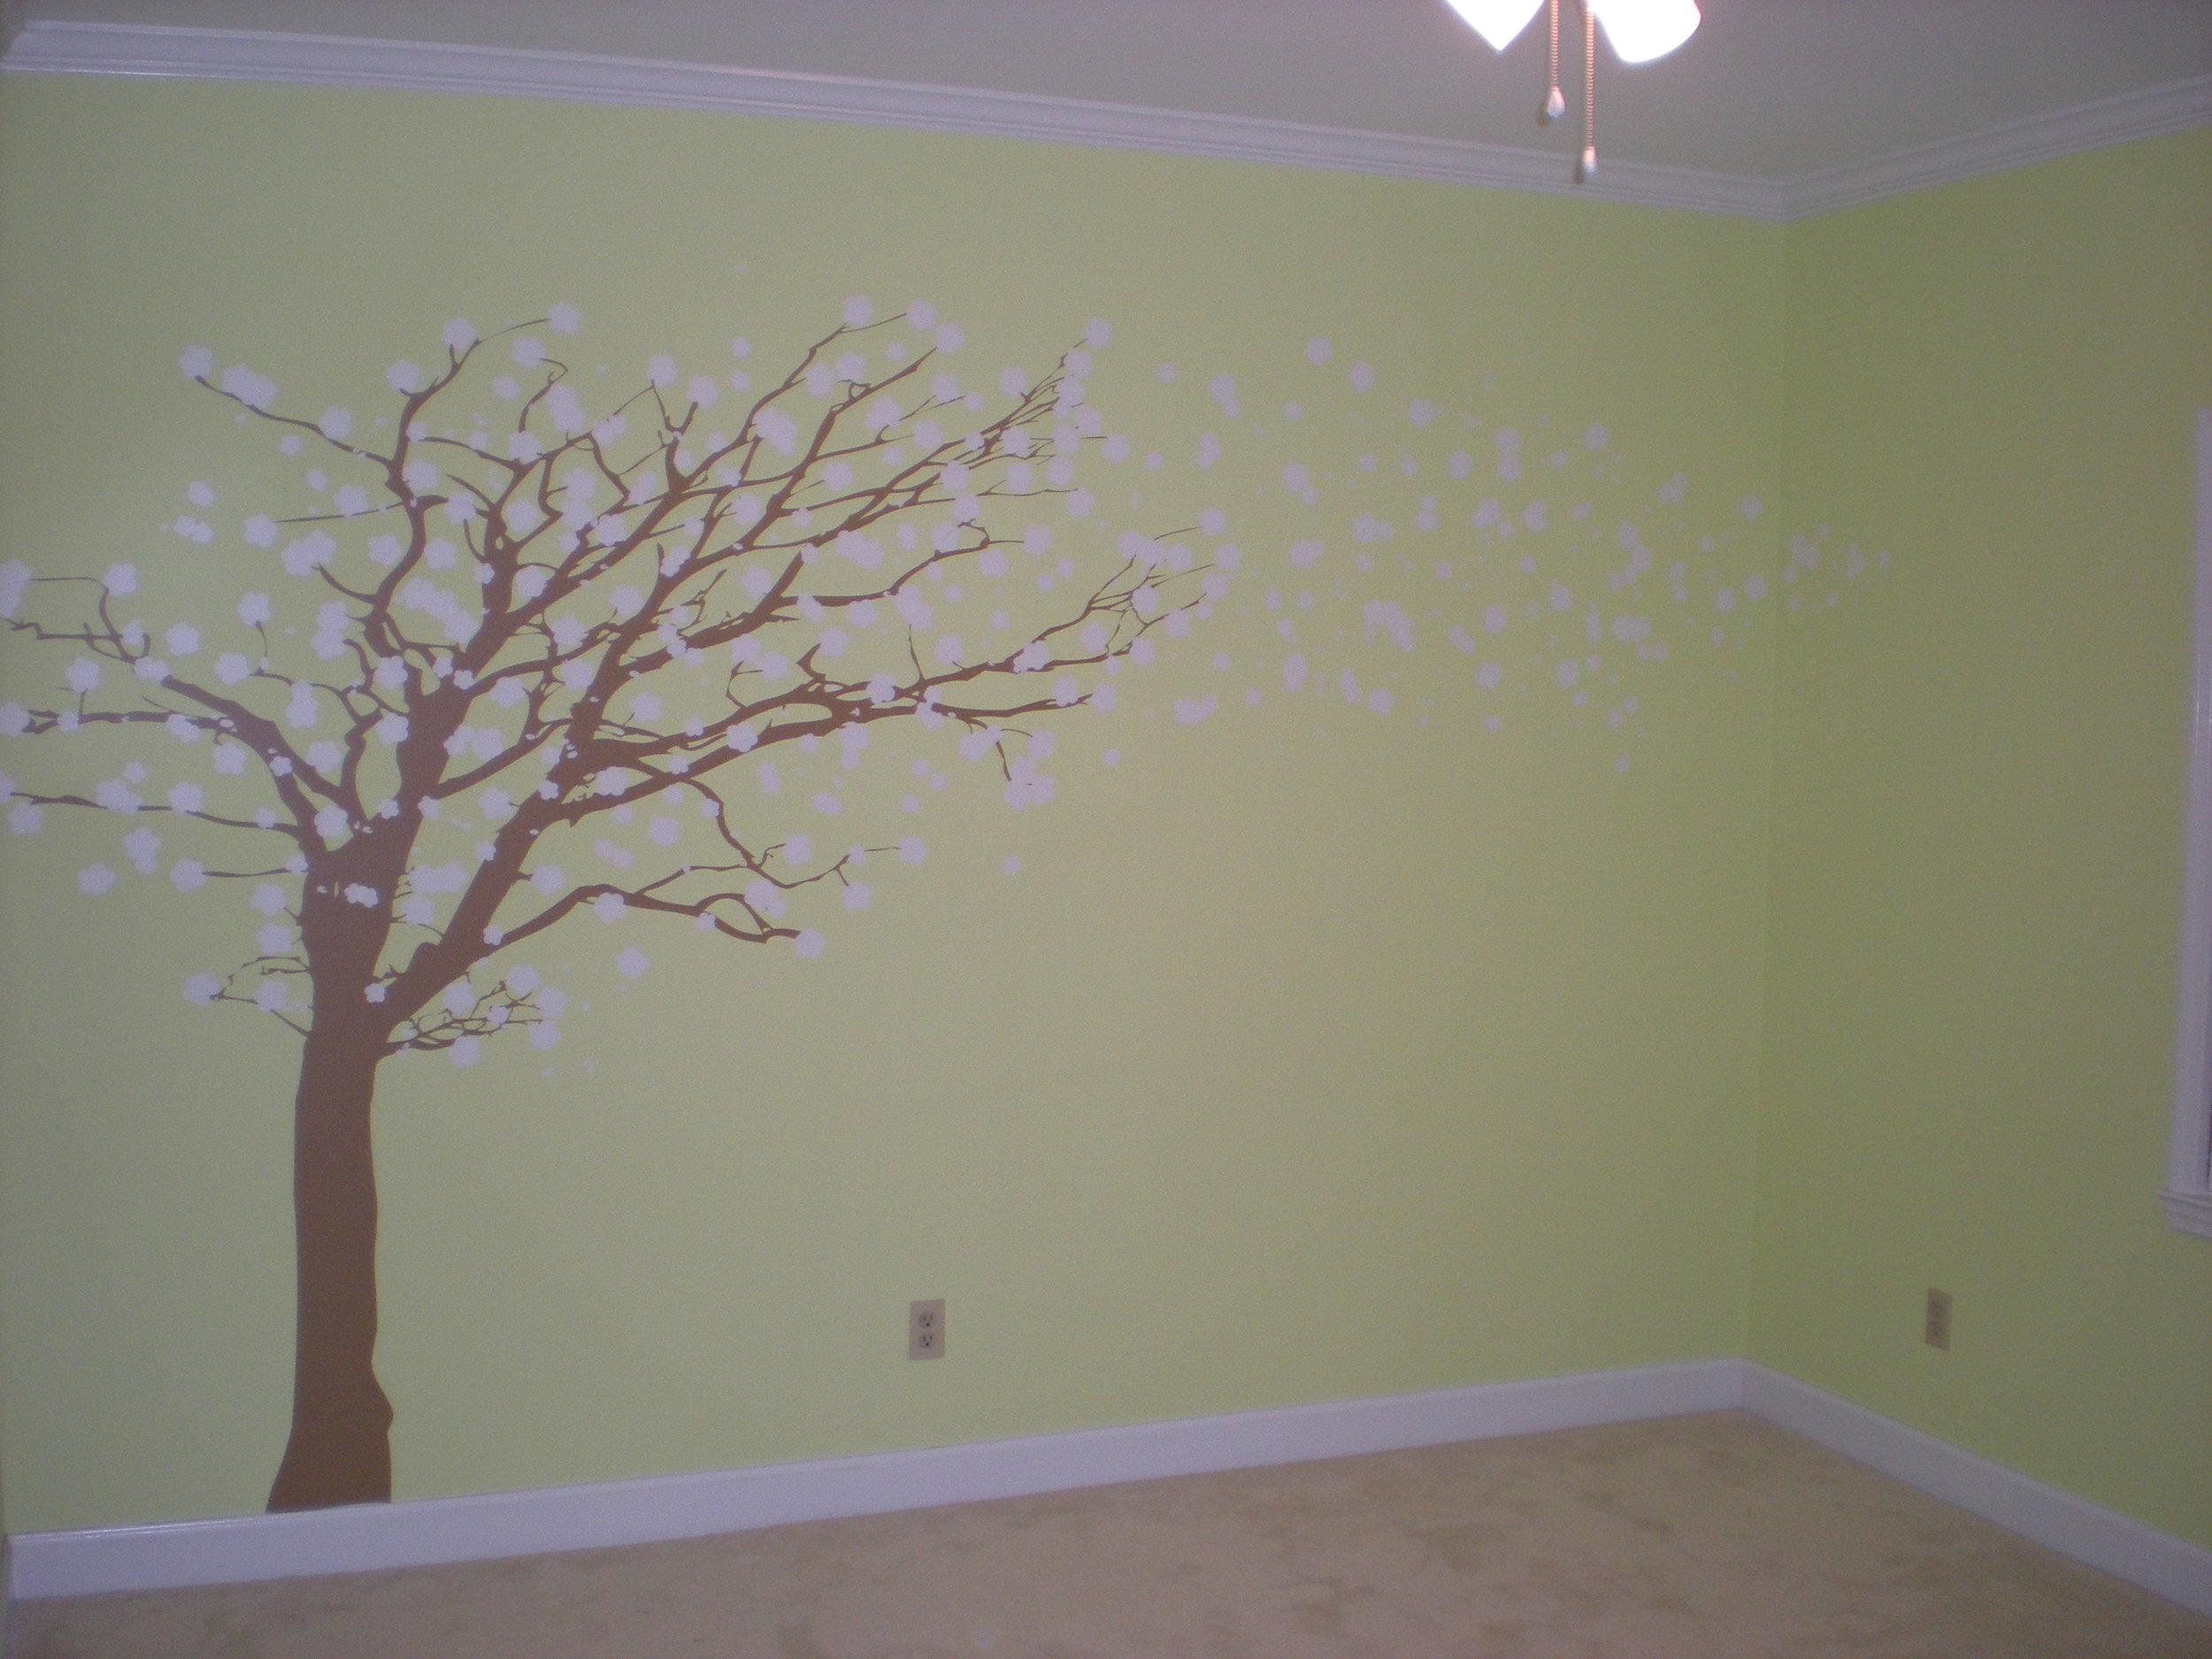 Interior wall design Augusta, Georgia.  This is an application process.